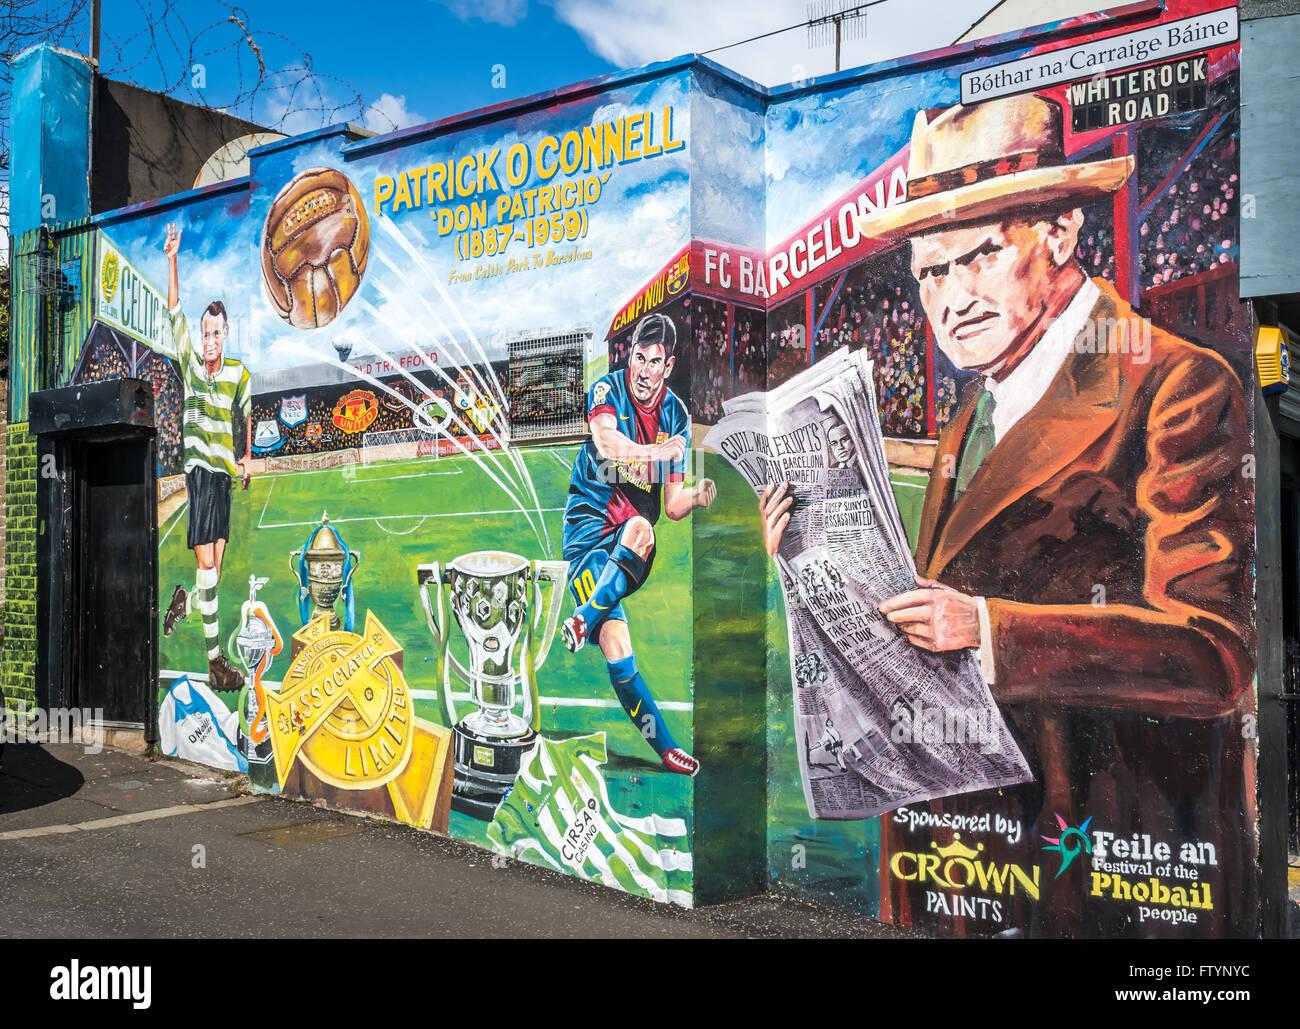 Patrick O' Connell Celtic und Barcelona Wandbild in West Belfast Stockfoto